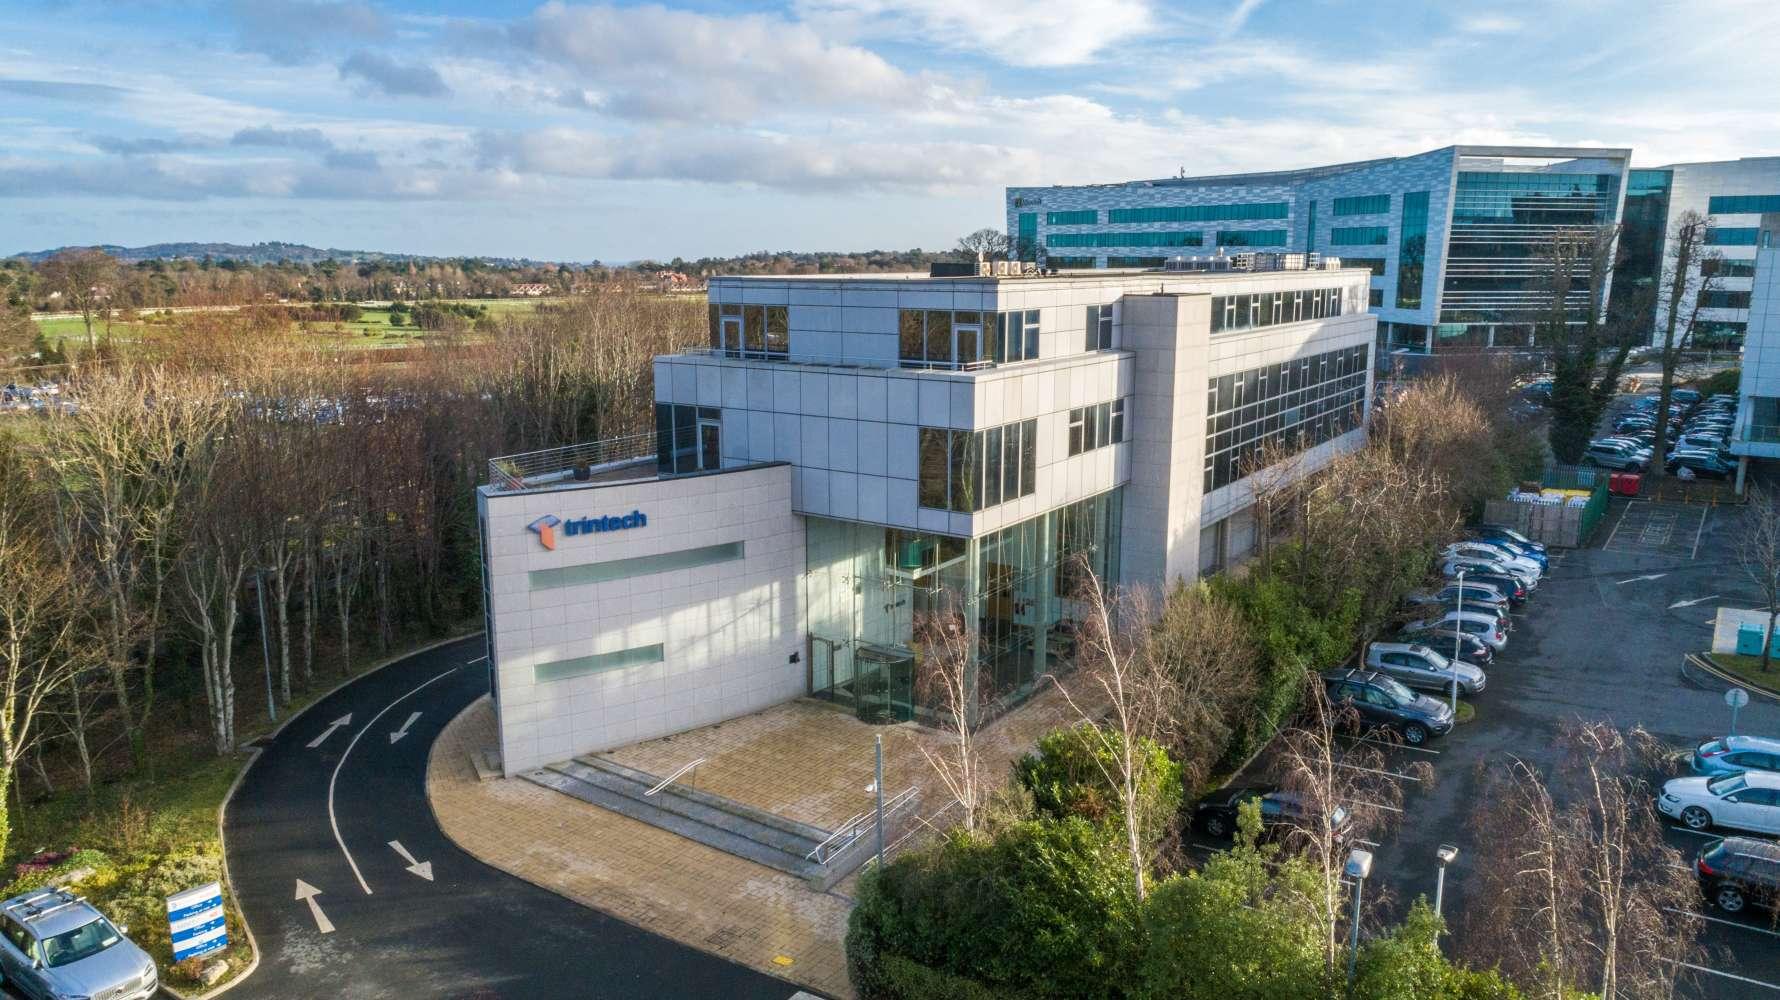 Office Dublin 18, D18 H5H9 - Ground Floor, First Floor and Second Floor Suites, Trintech Building